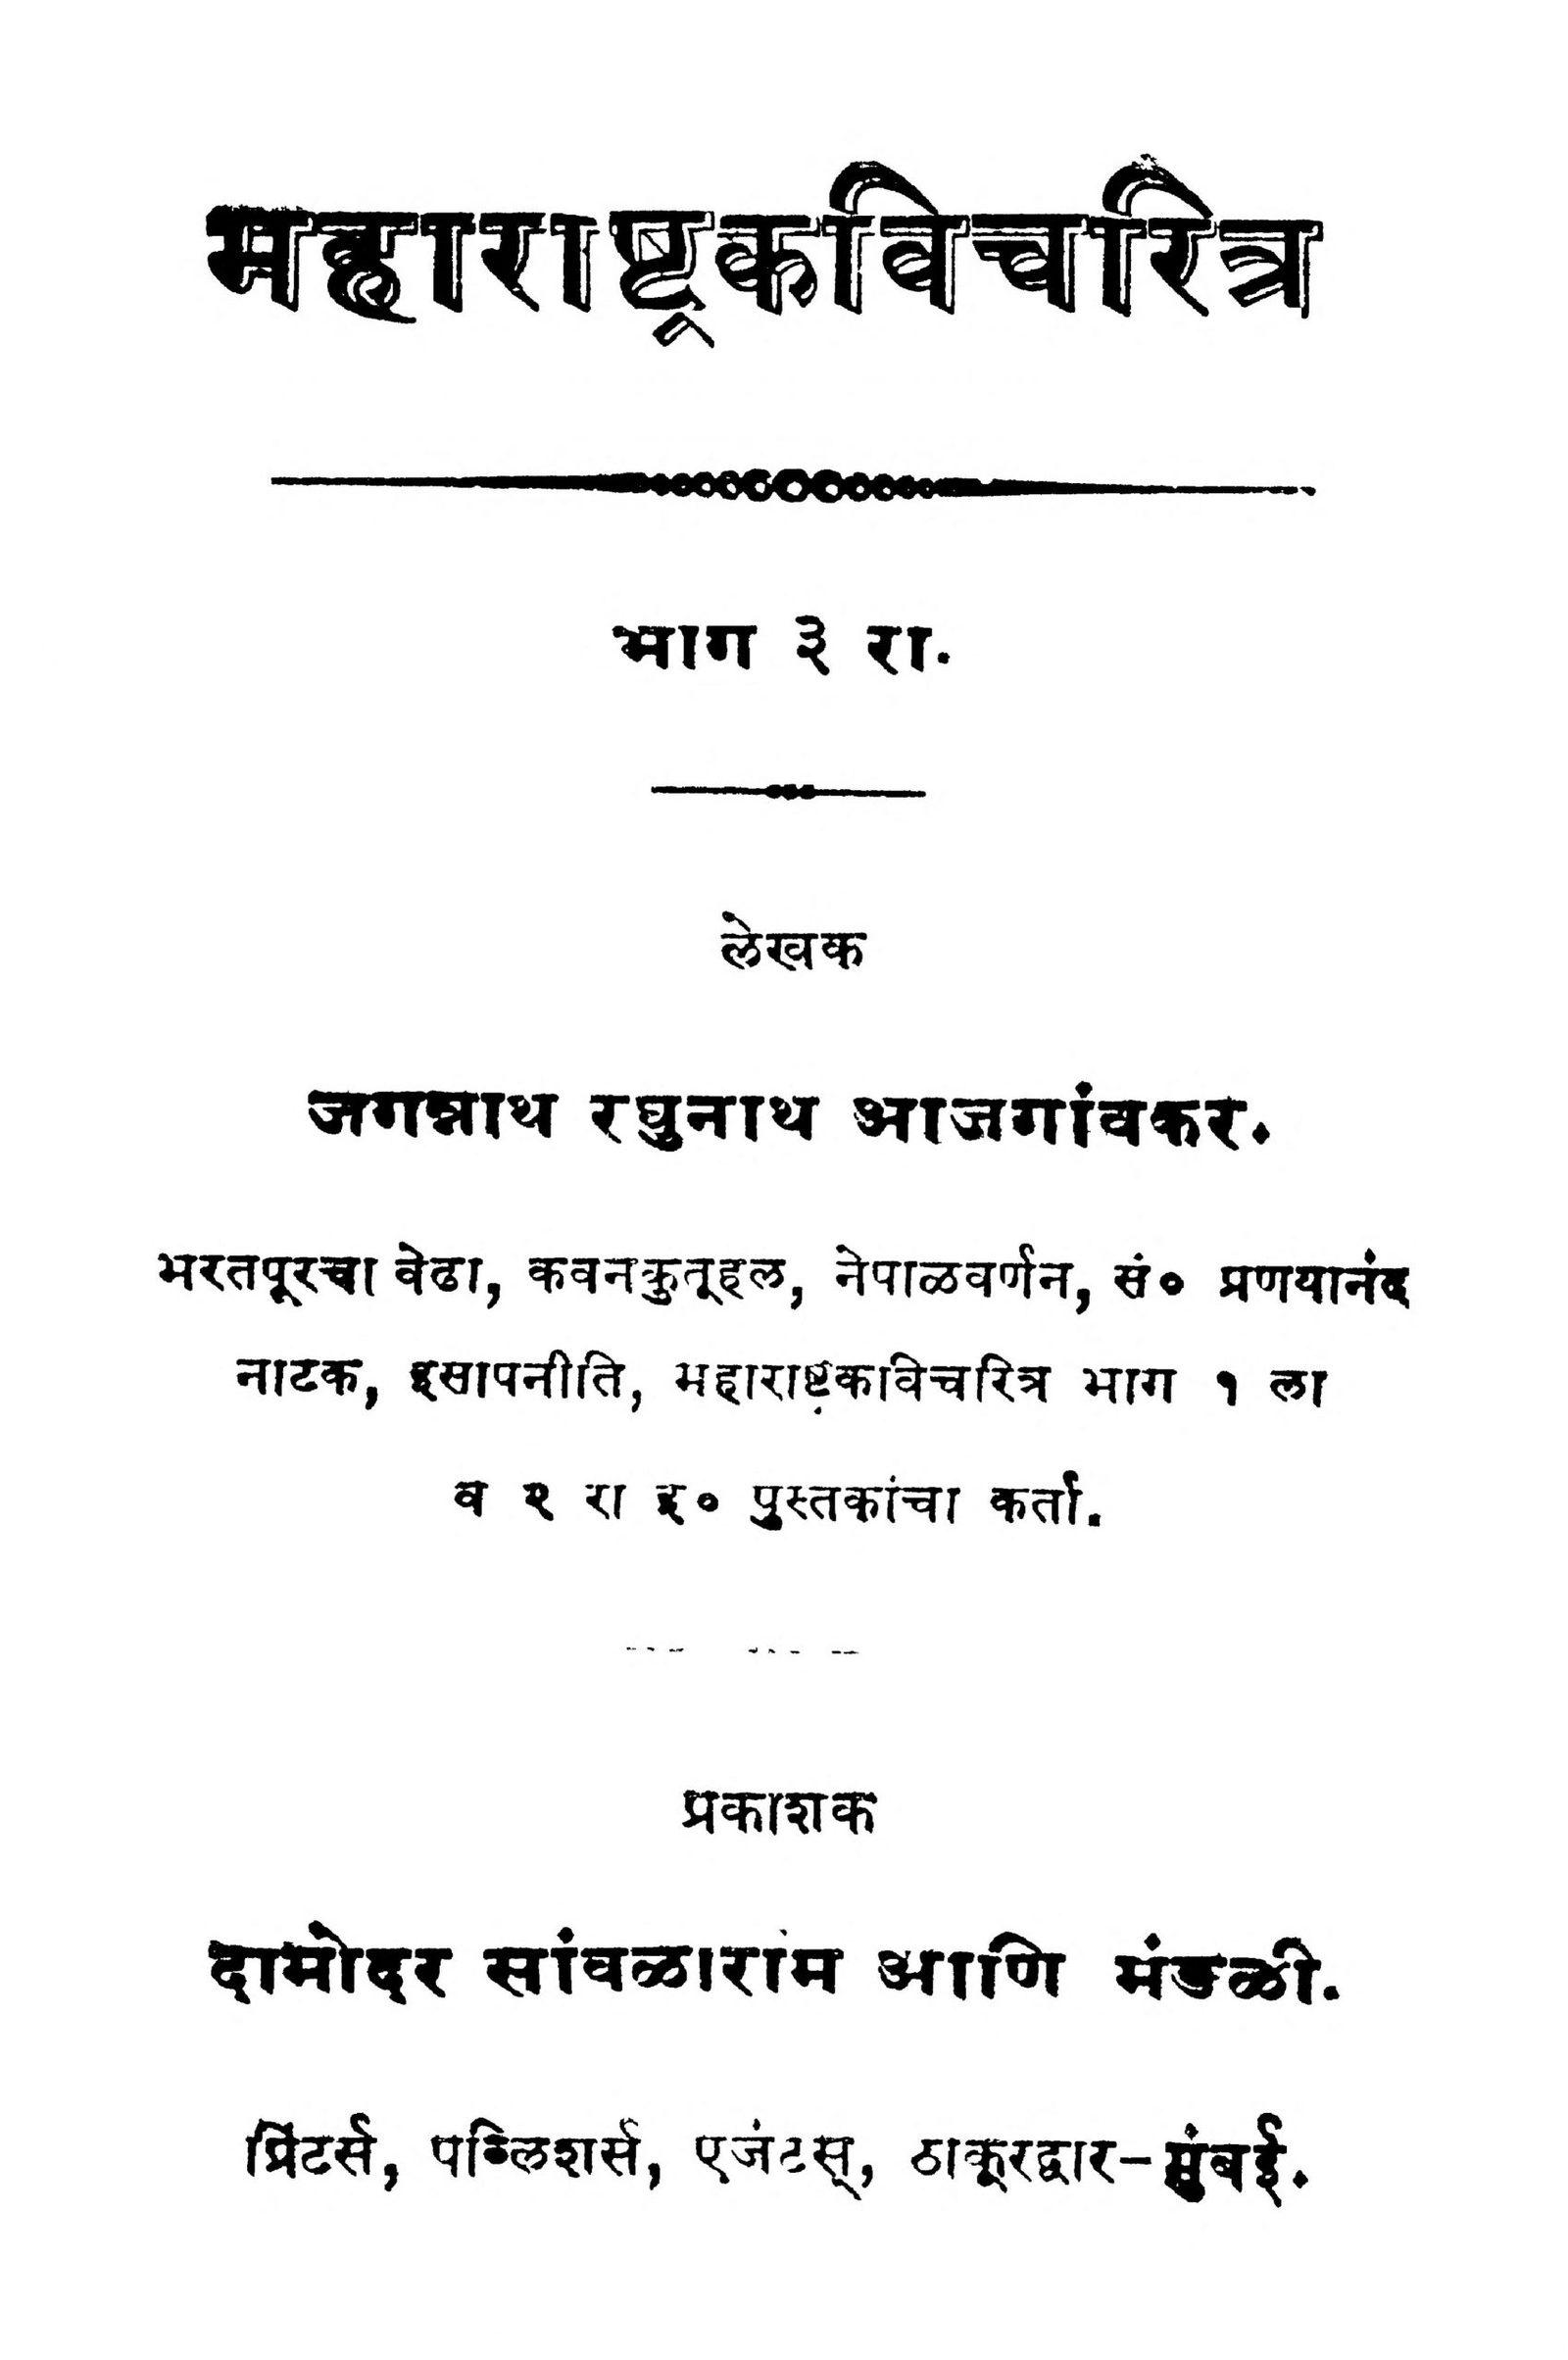 Book Image : महाराष्ट्र कविचारित्र ३ - Mahaaraashtra ~ kavicharitra 3